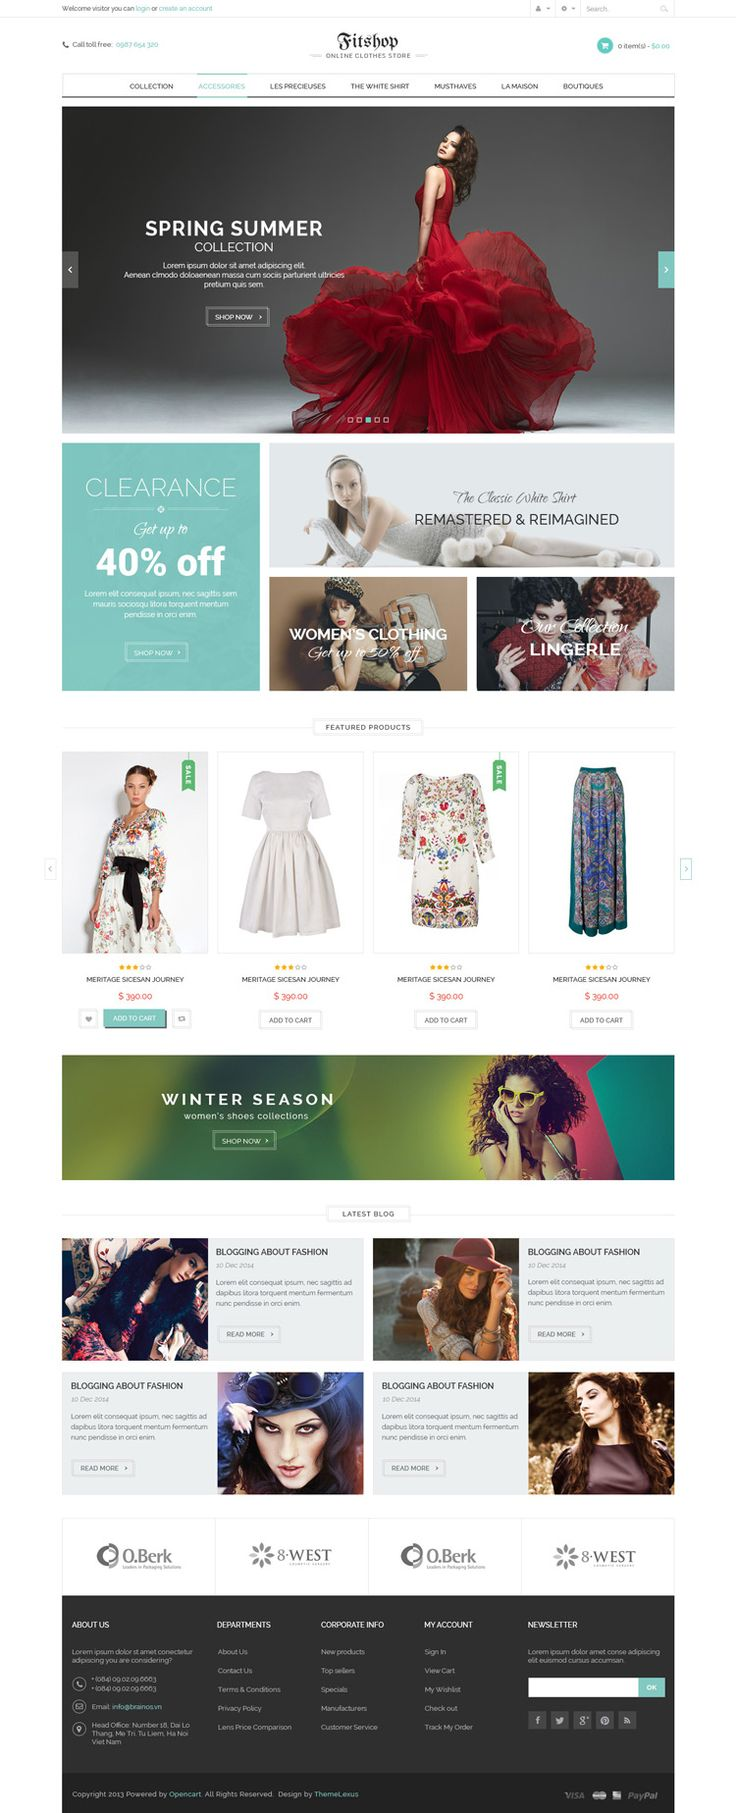 #fashion, simple, block, #concept, #layout